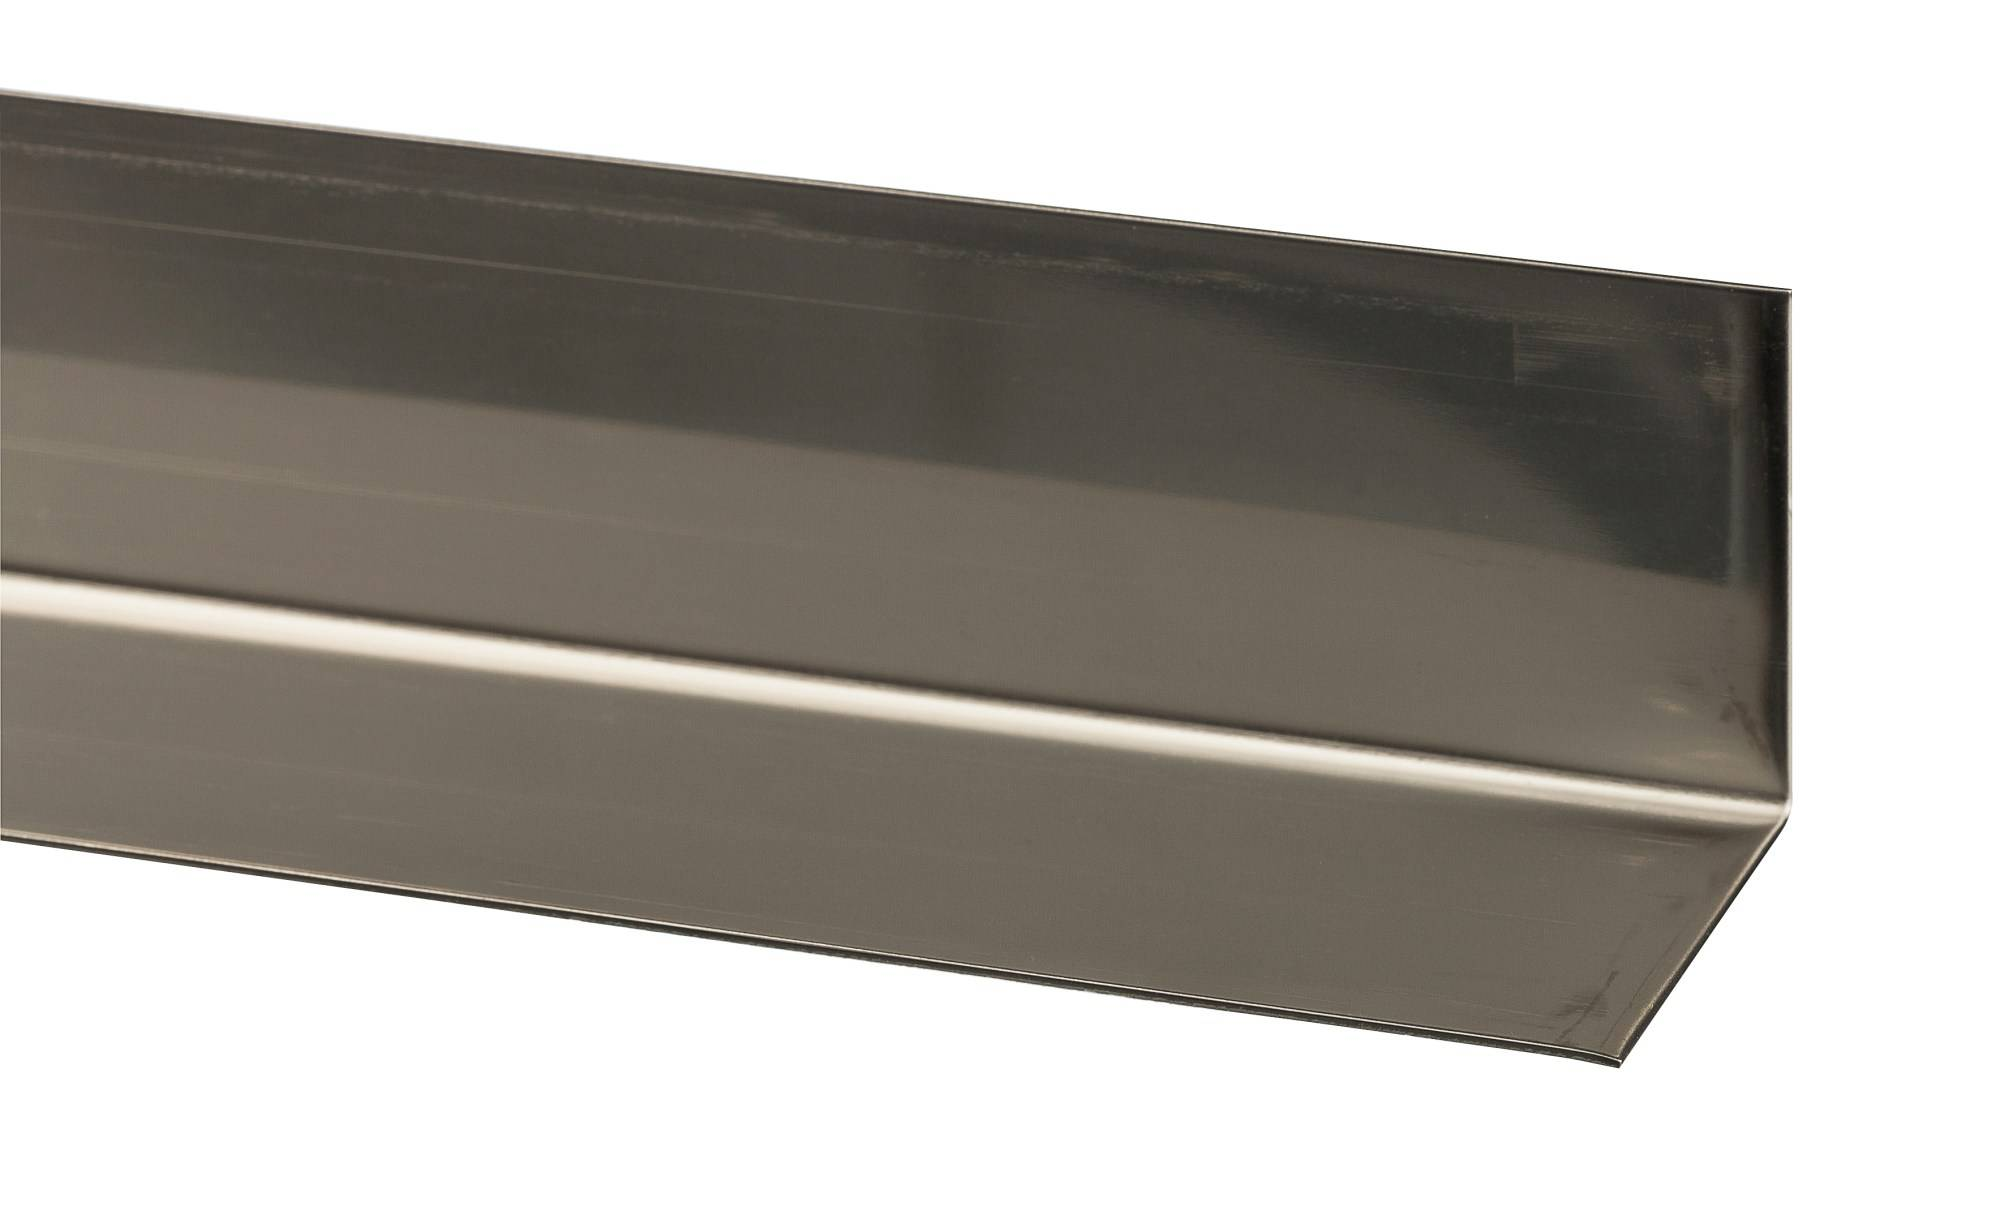 Alfer 40/40 - 0,8mm ruostumaton teräs  2,5m kulmalista